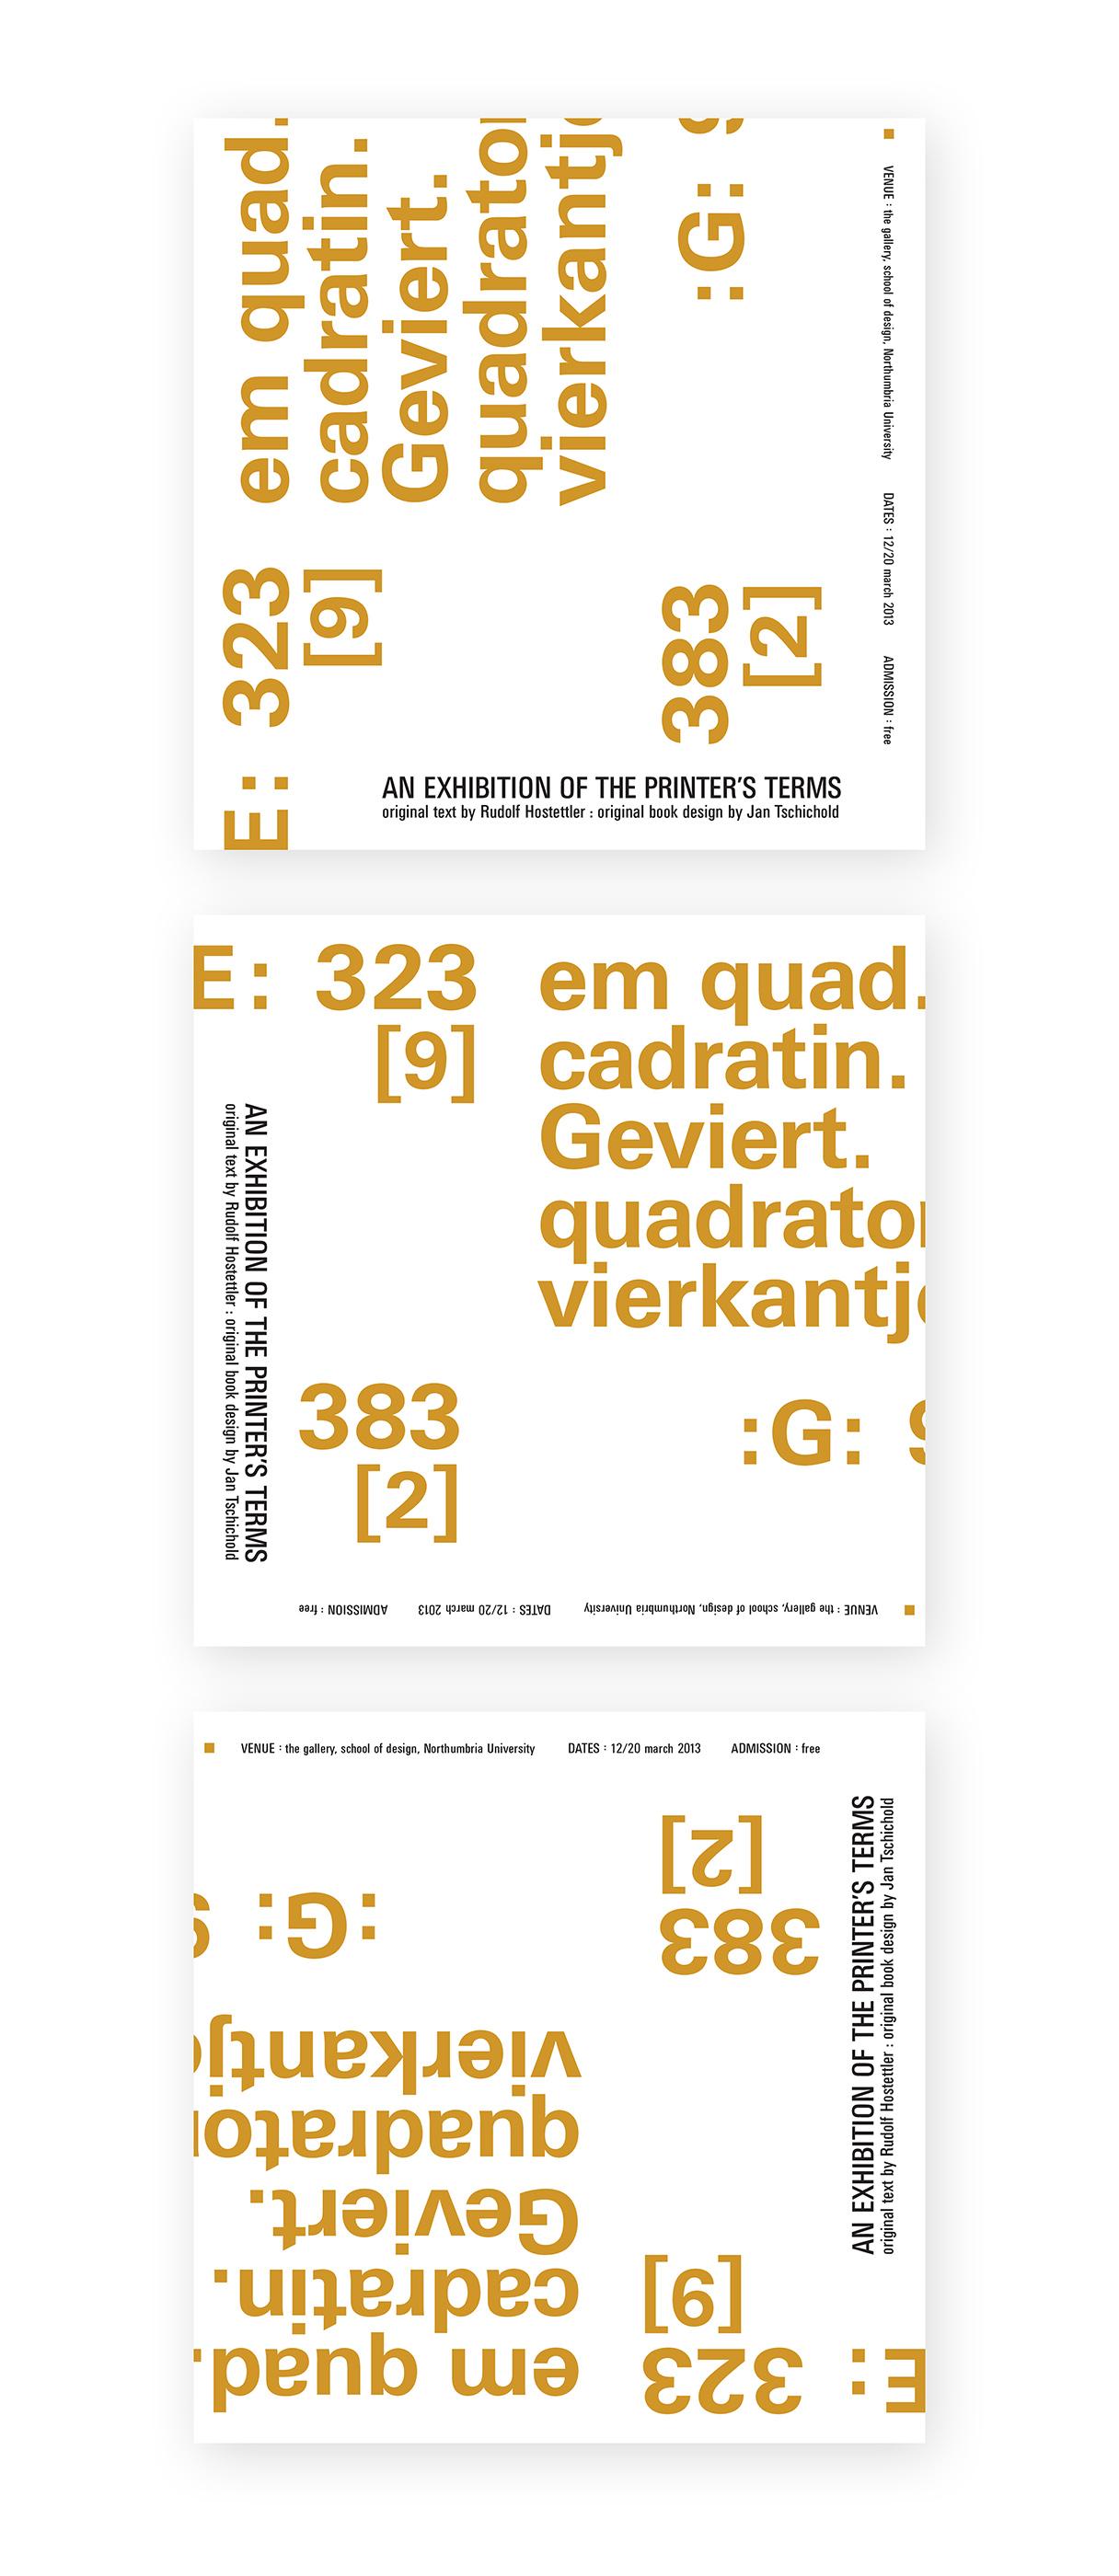 printers terms invitation mockup3.jpg